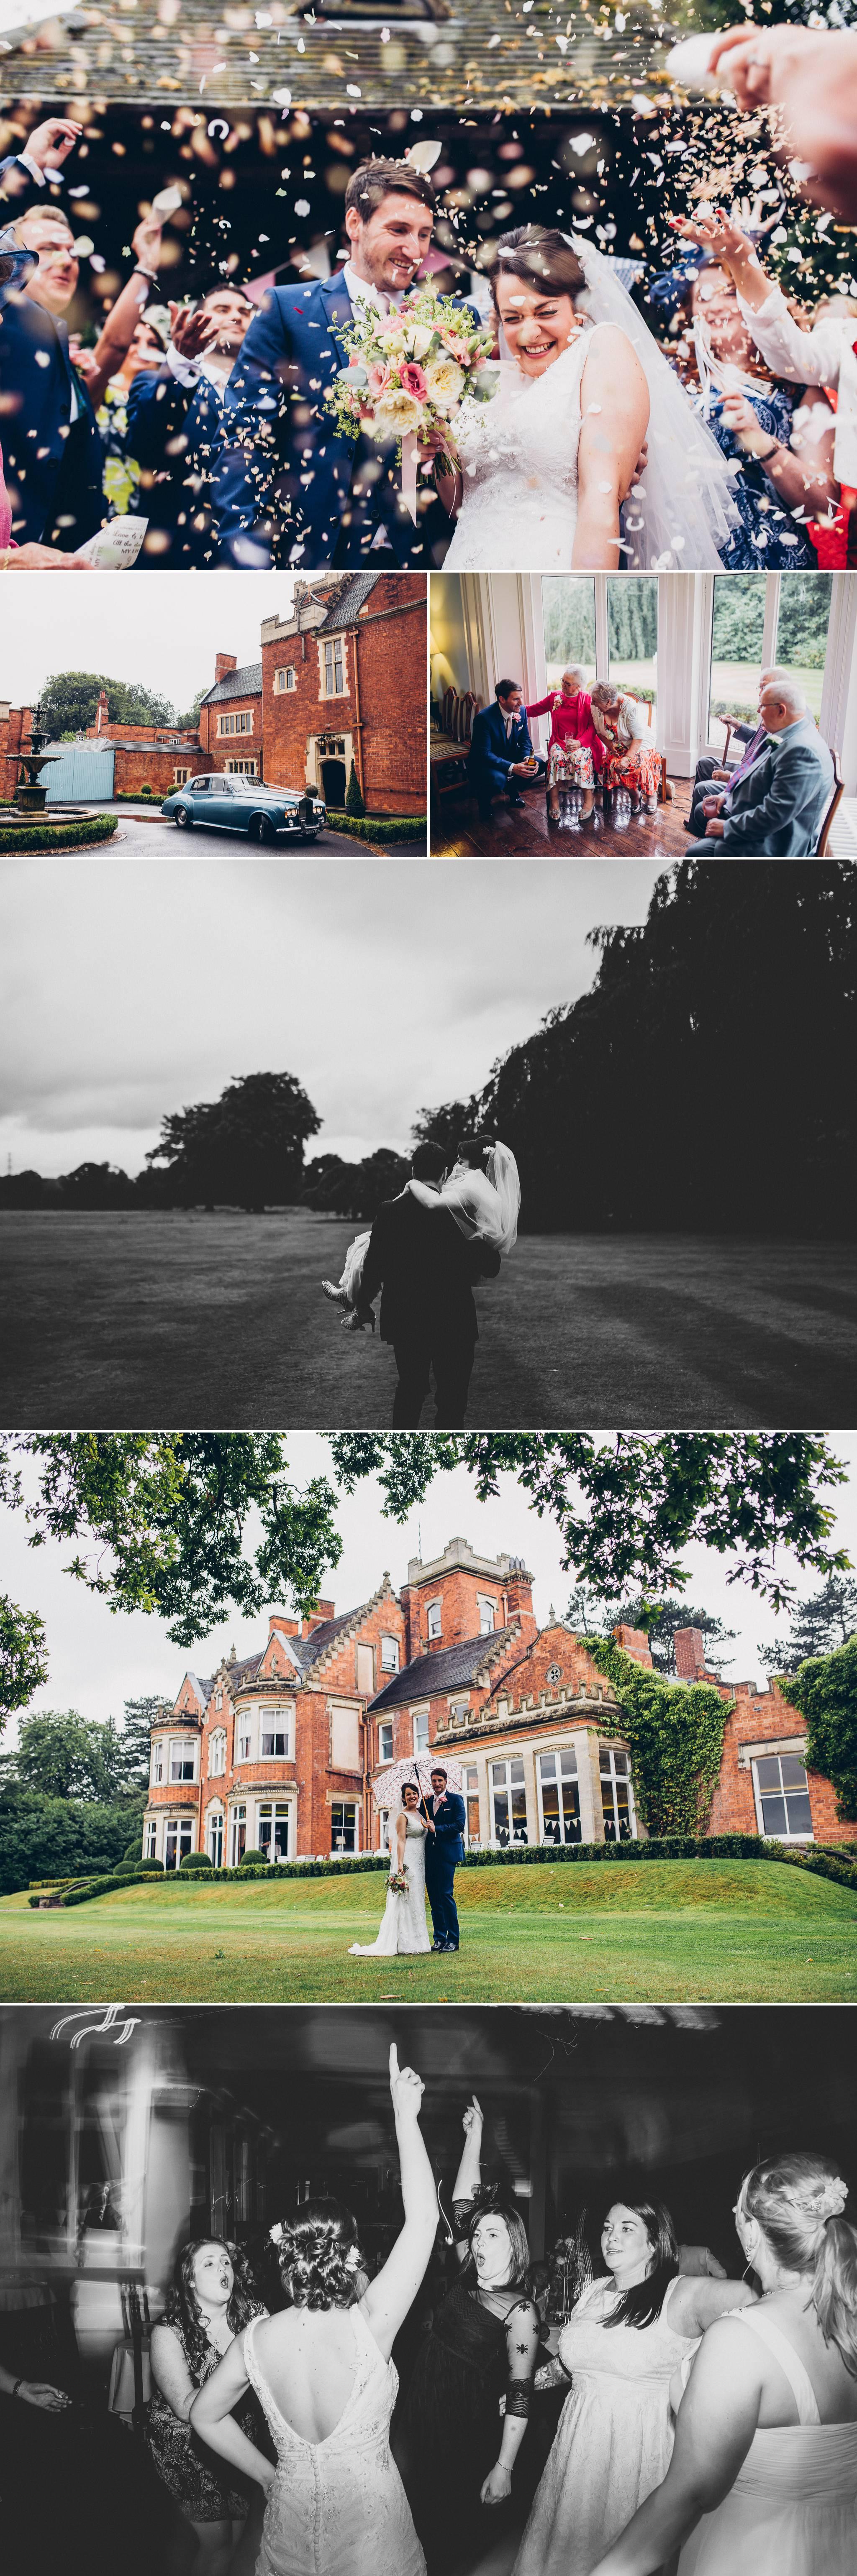 staffordshire-wedding-photographer 35.jpg